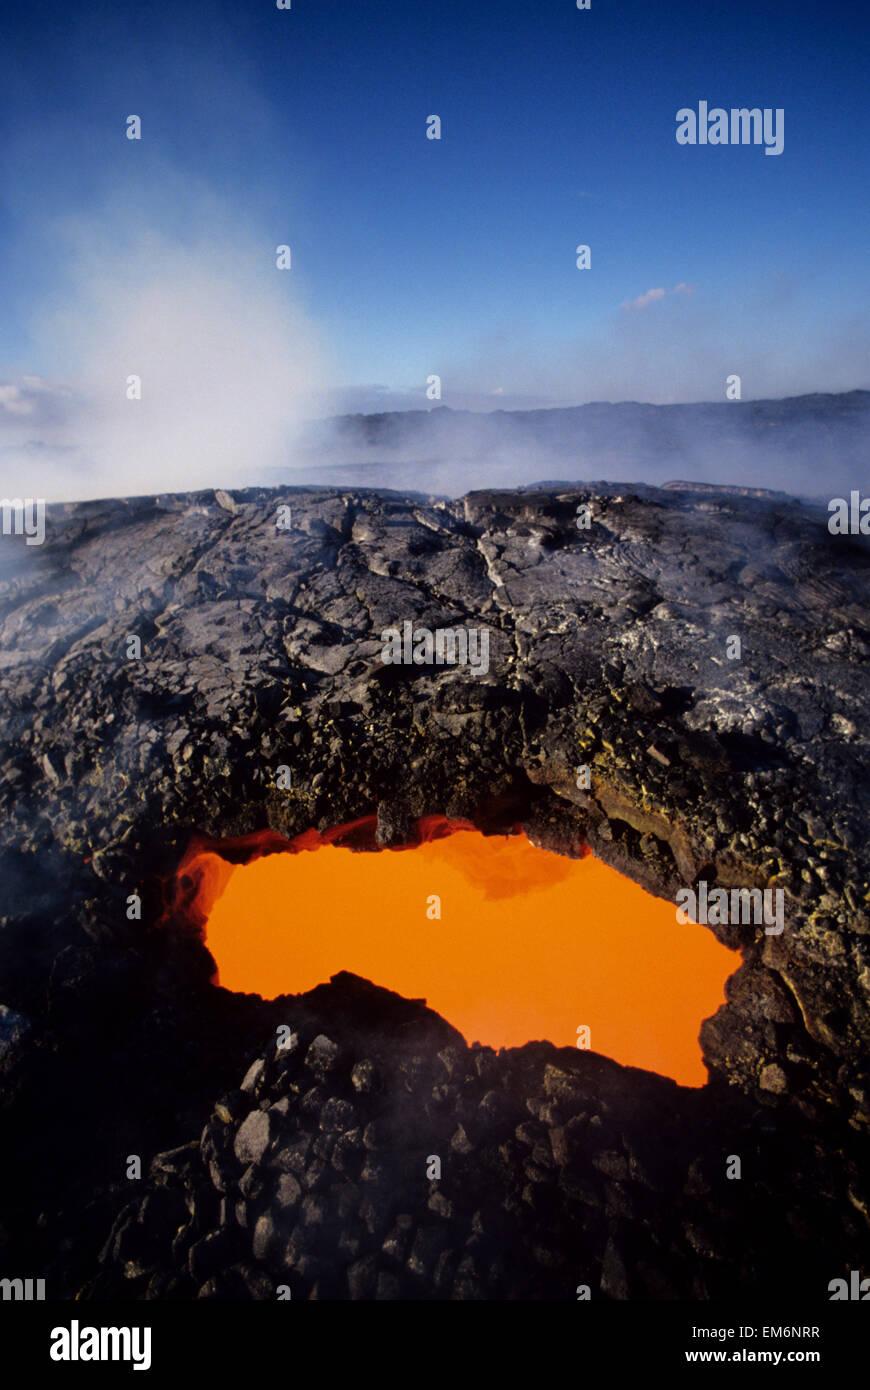 USA, Hawaii, Hawaii Volcanoes National Park; Big Island, East Rift Zone, Opening To Active Lava Tube Showing Orange - Stock Image